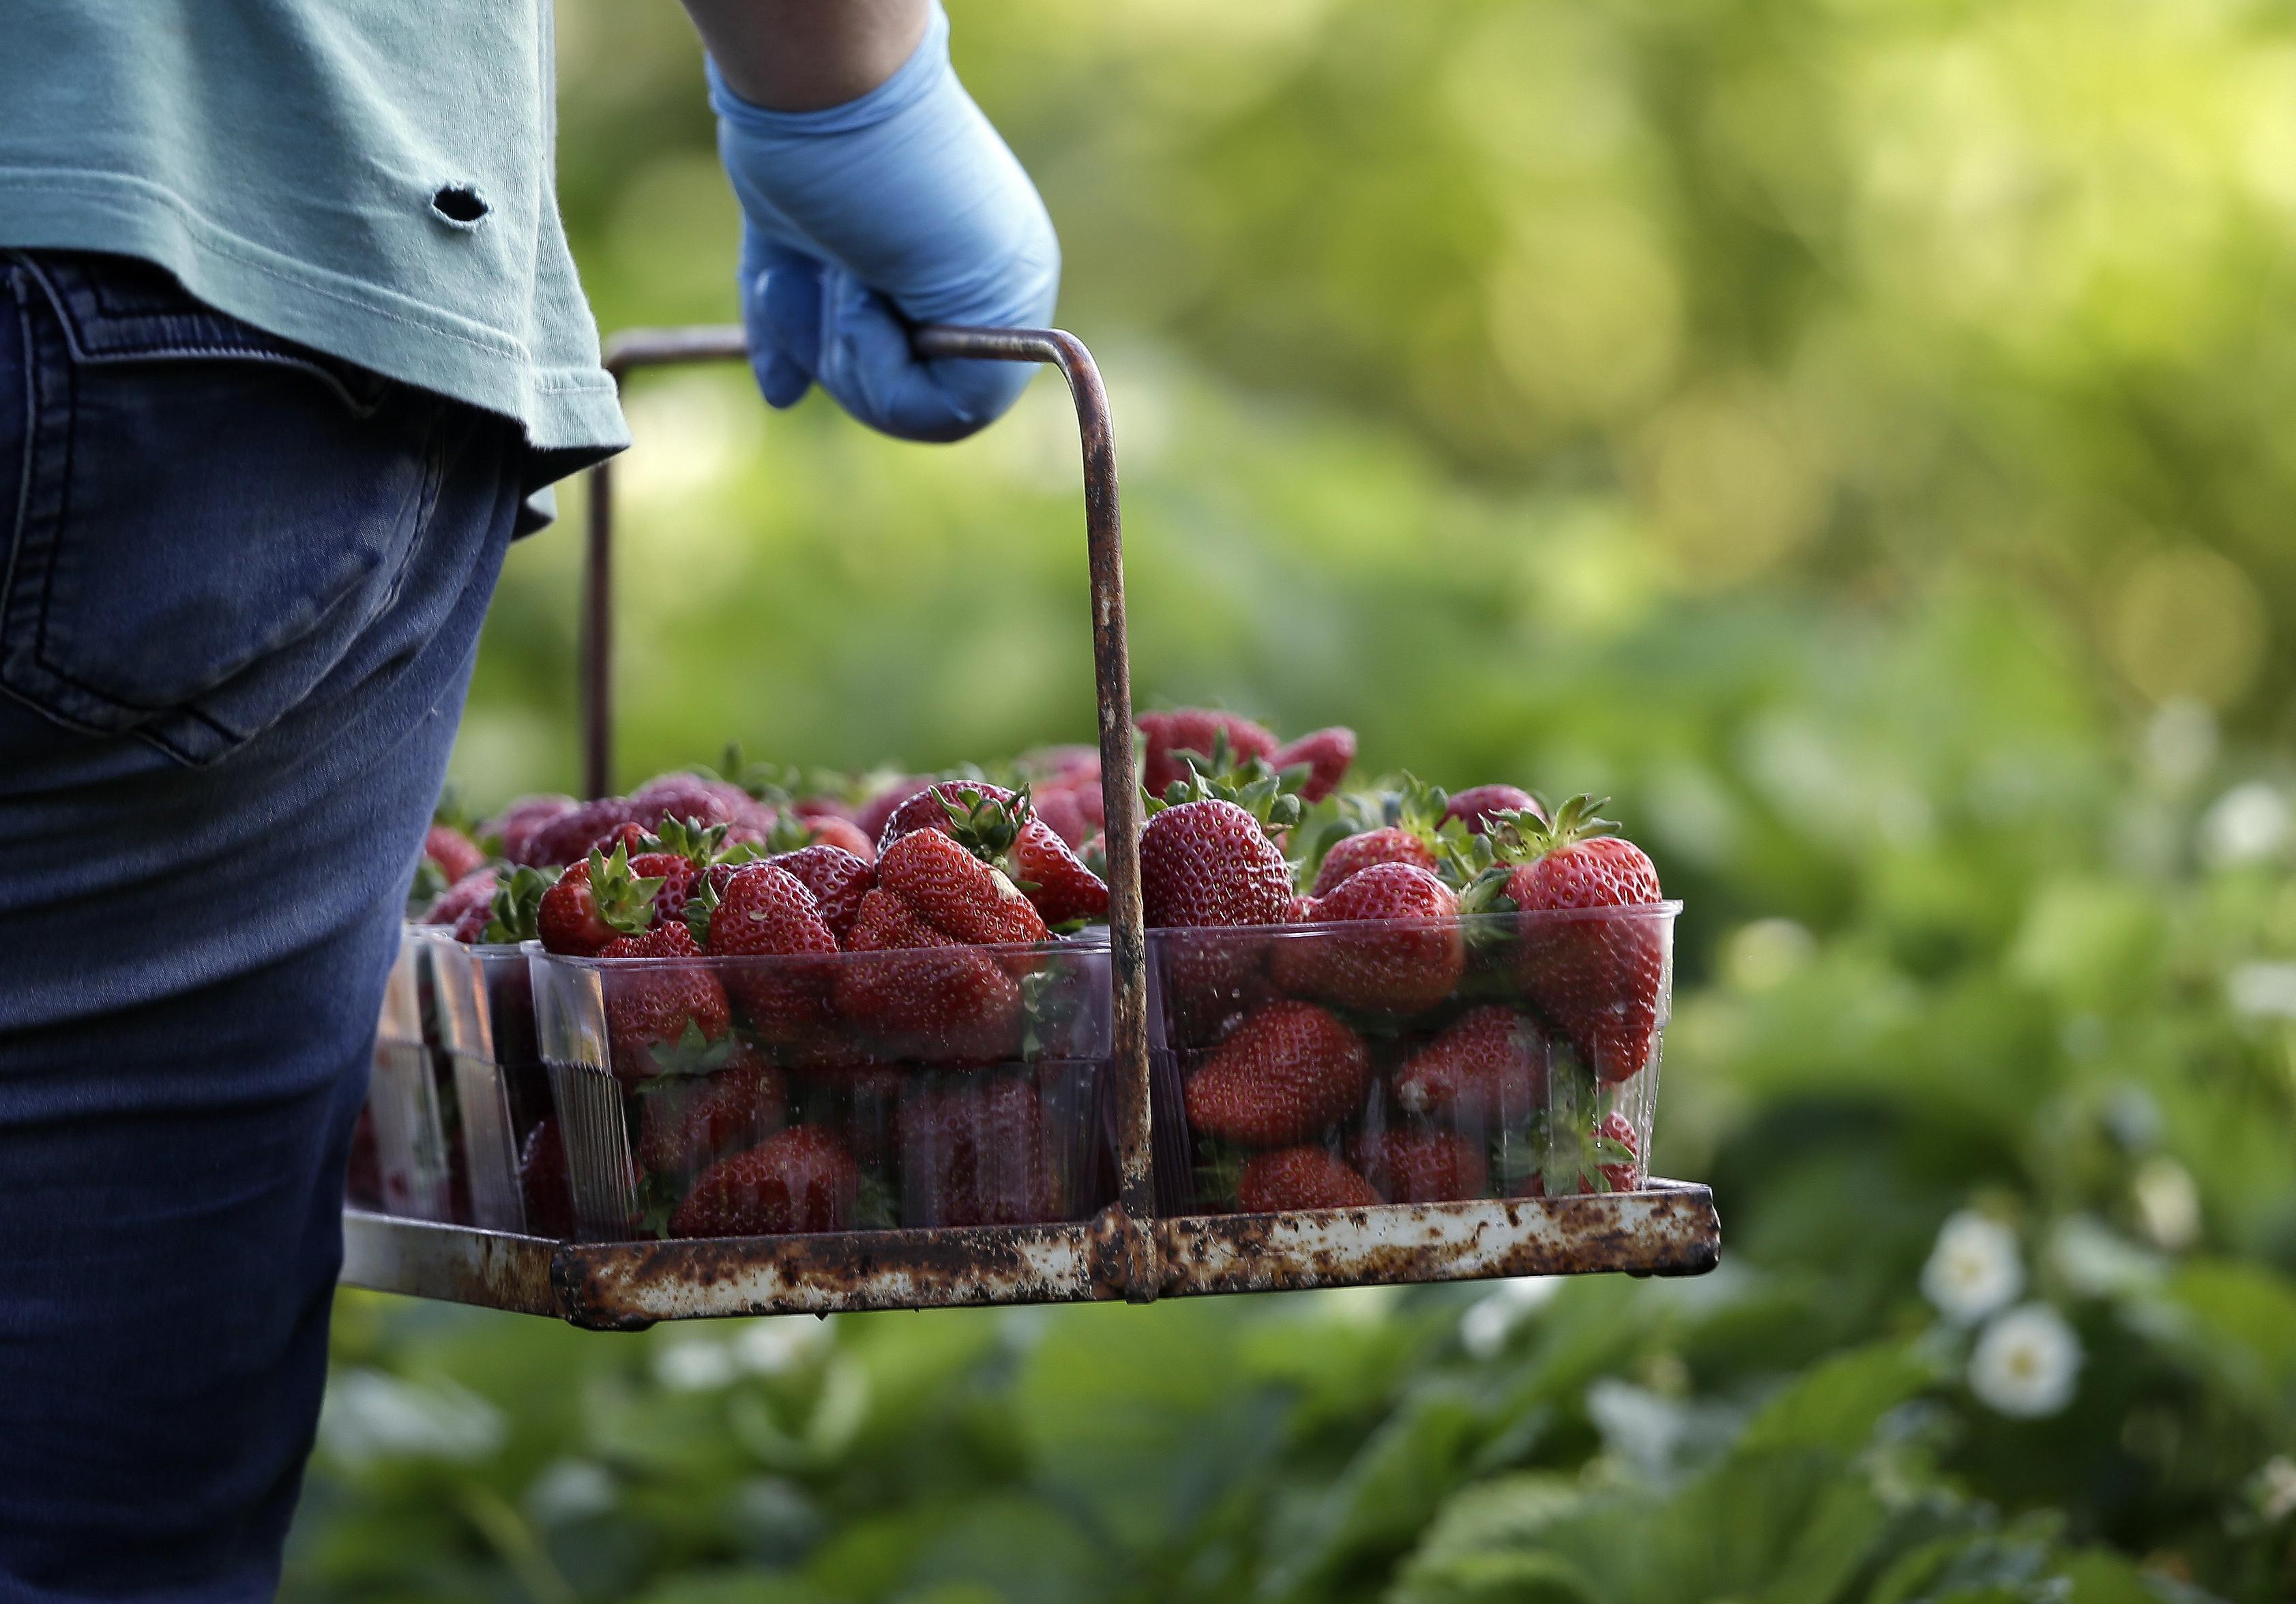 strawberry season, picking, bucket